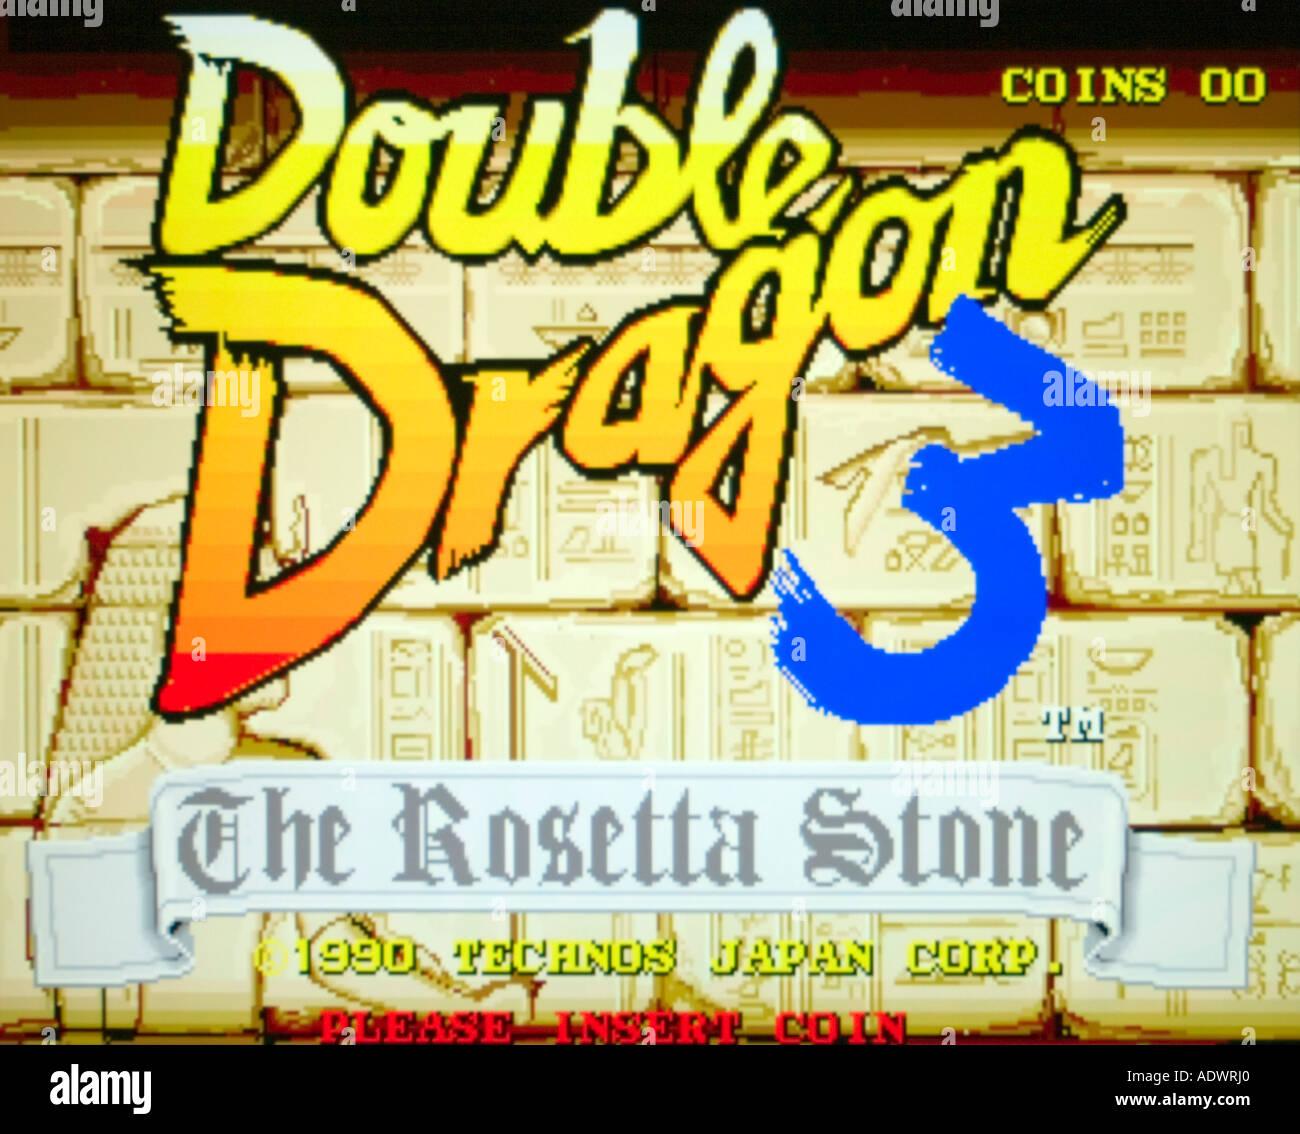 Double Dragon 3 The Rosetta Stone Technos Japan Corp 1990 Vintage